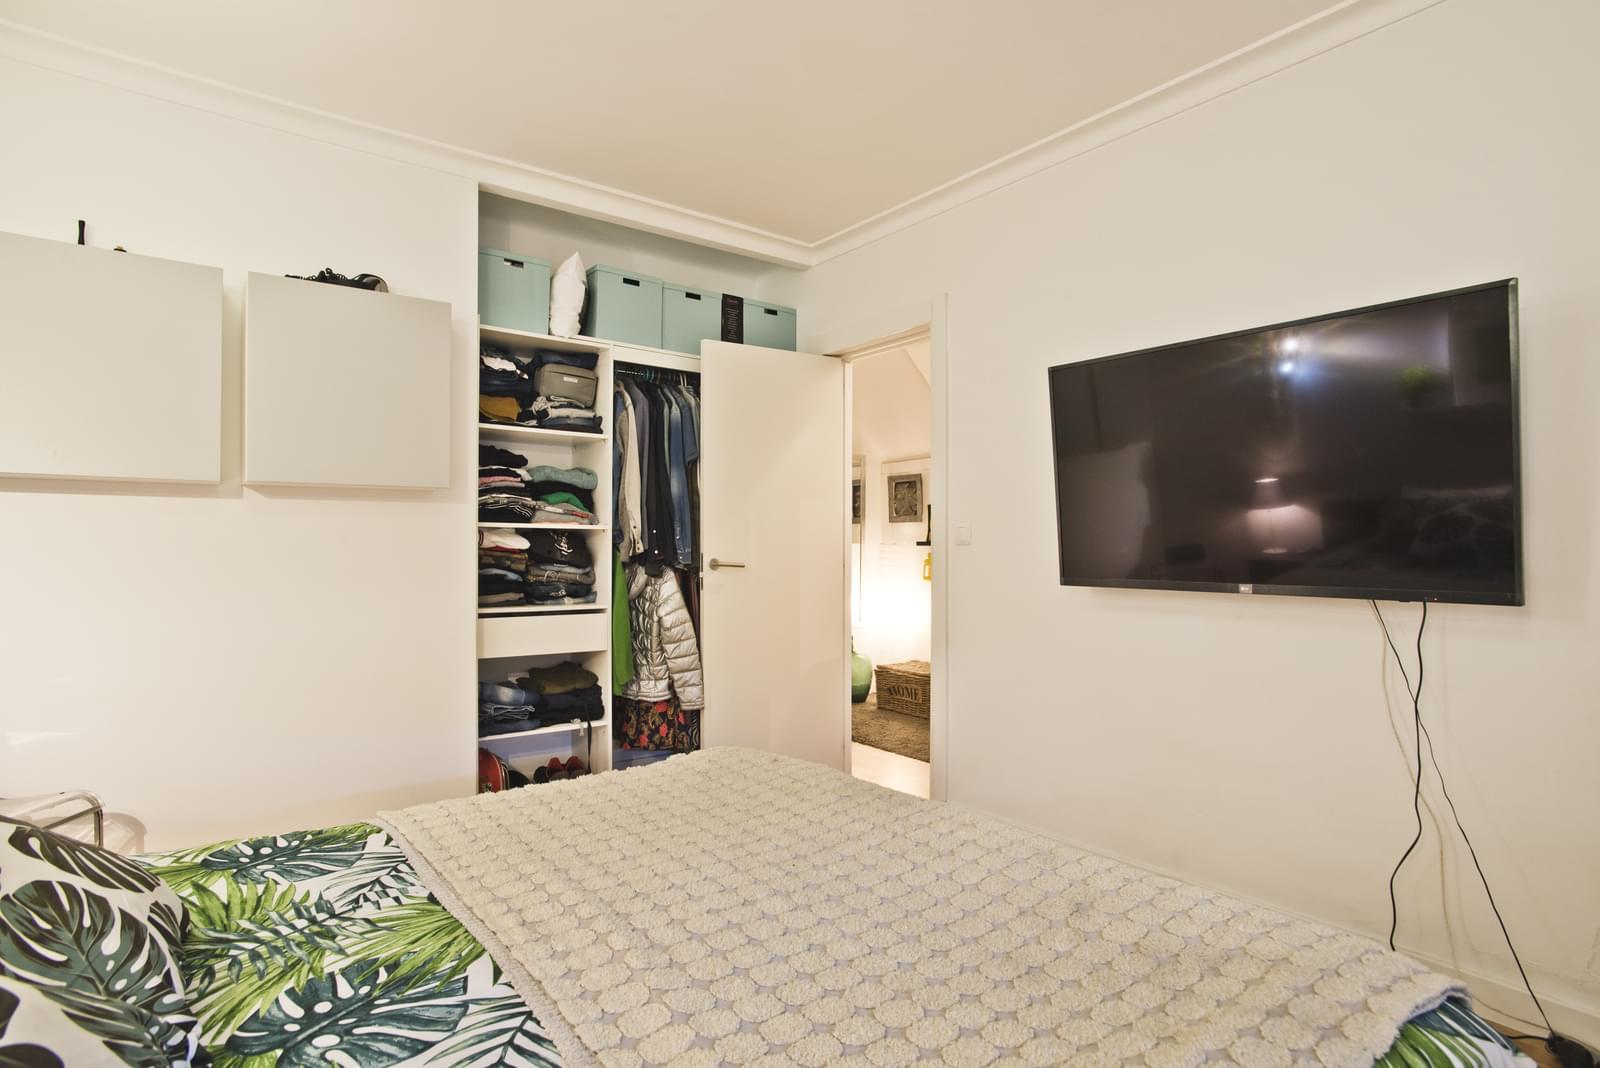 pf17010-apartamento-t4-cascais-69dc22aa-62a3-4384-9259-73d83281925d